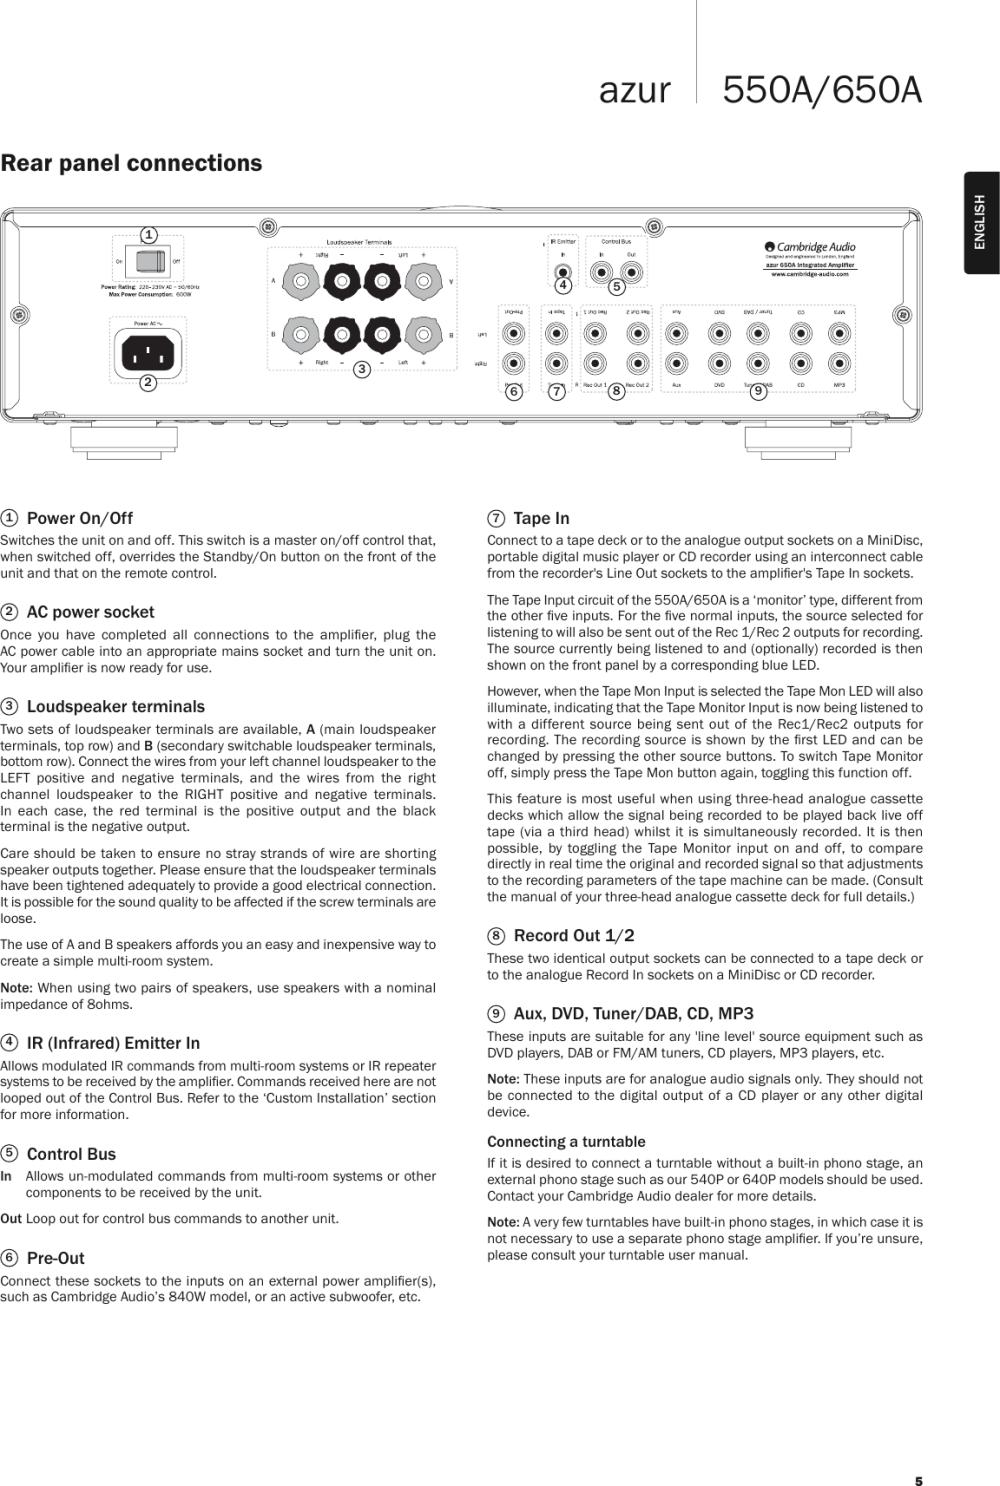 medium resolution of page 5 of 12 cambridge audio cambridge audio azur 550a